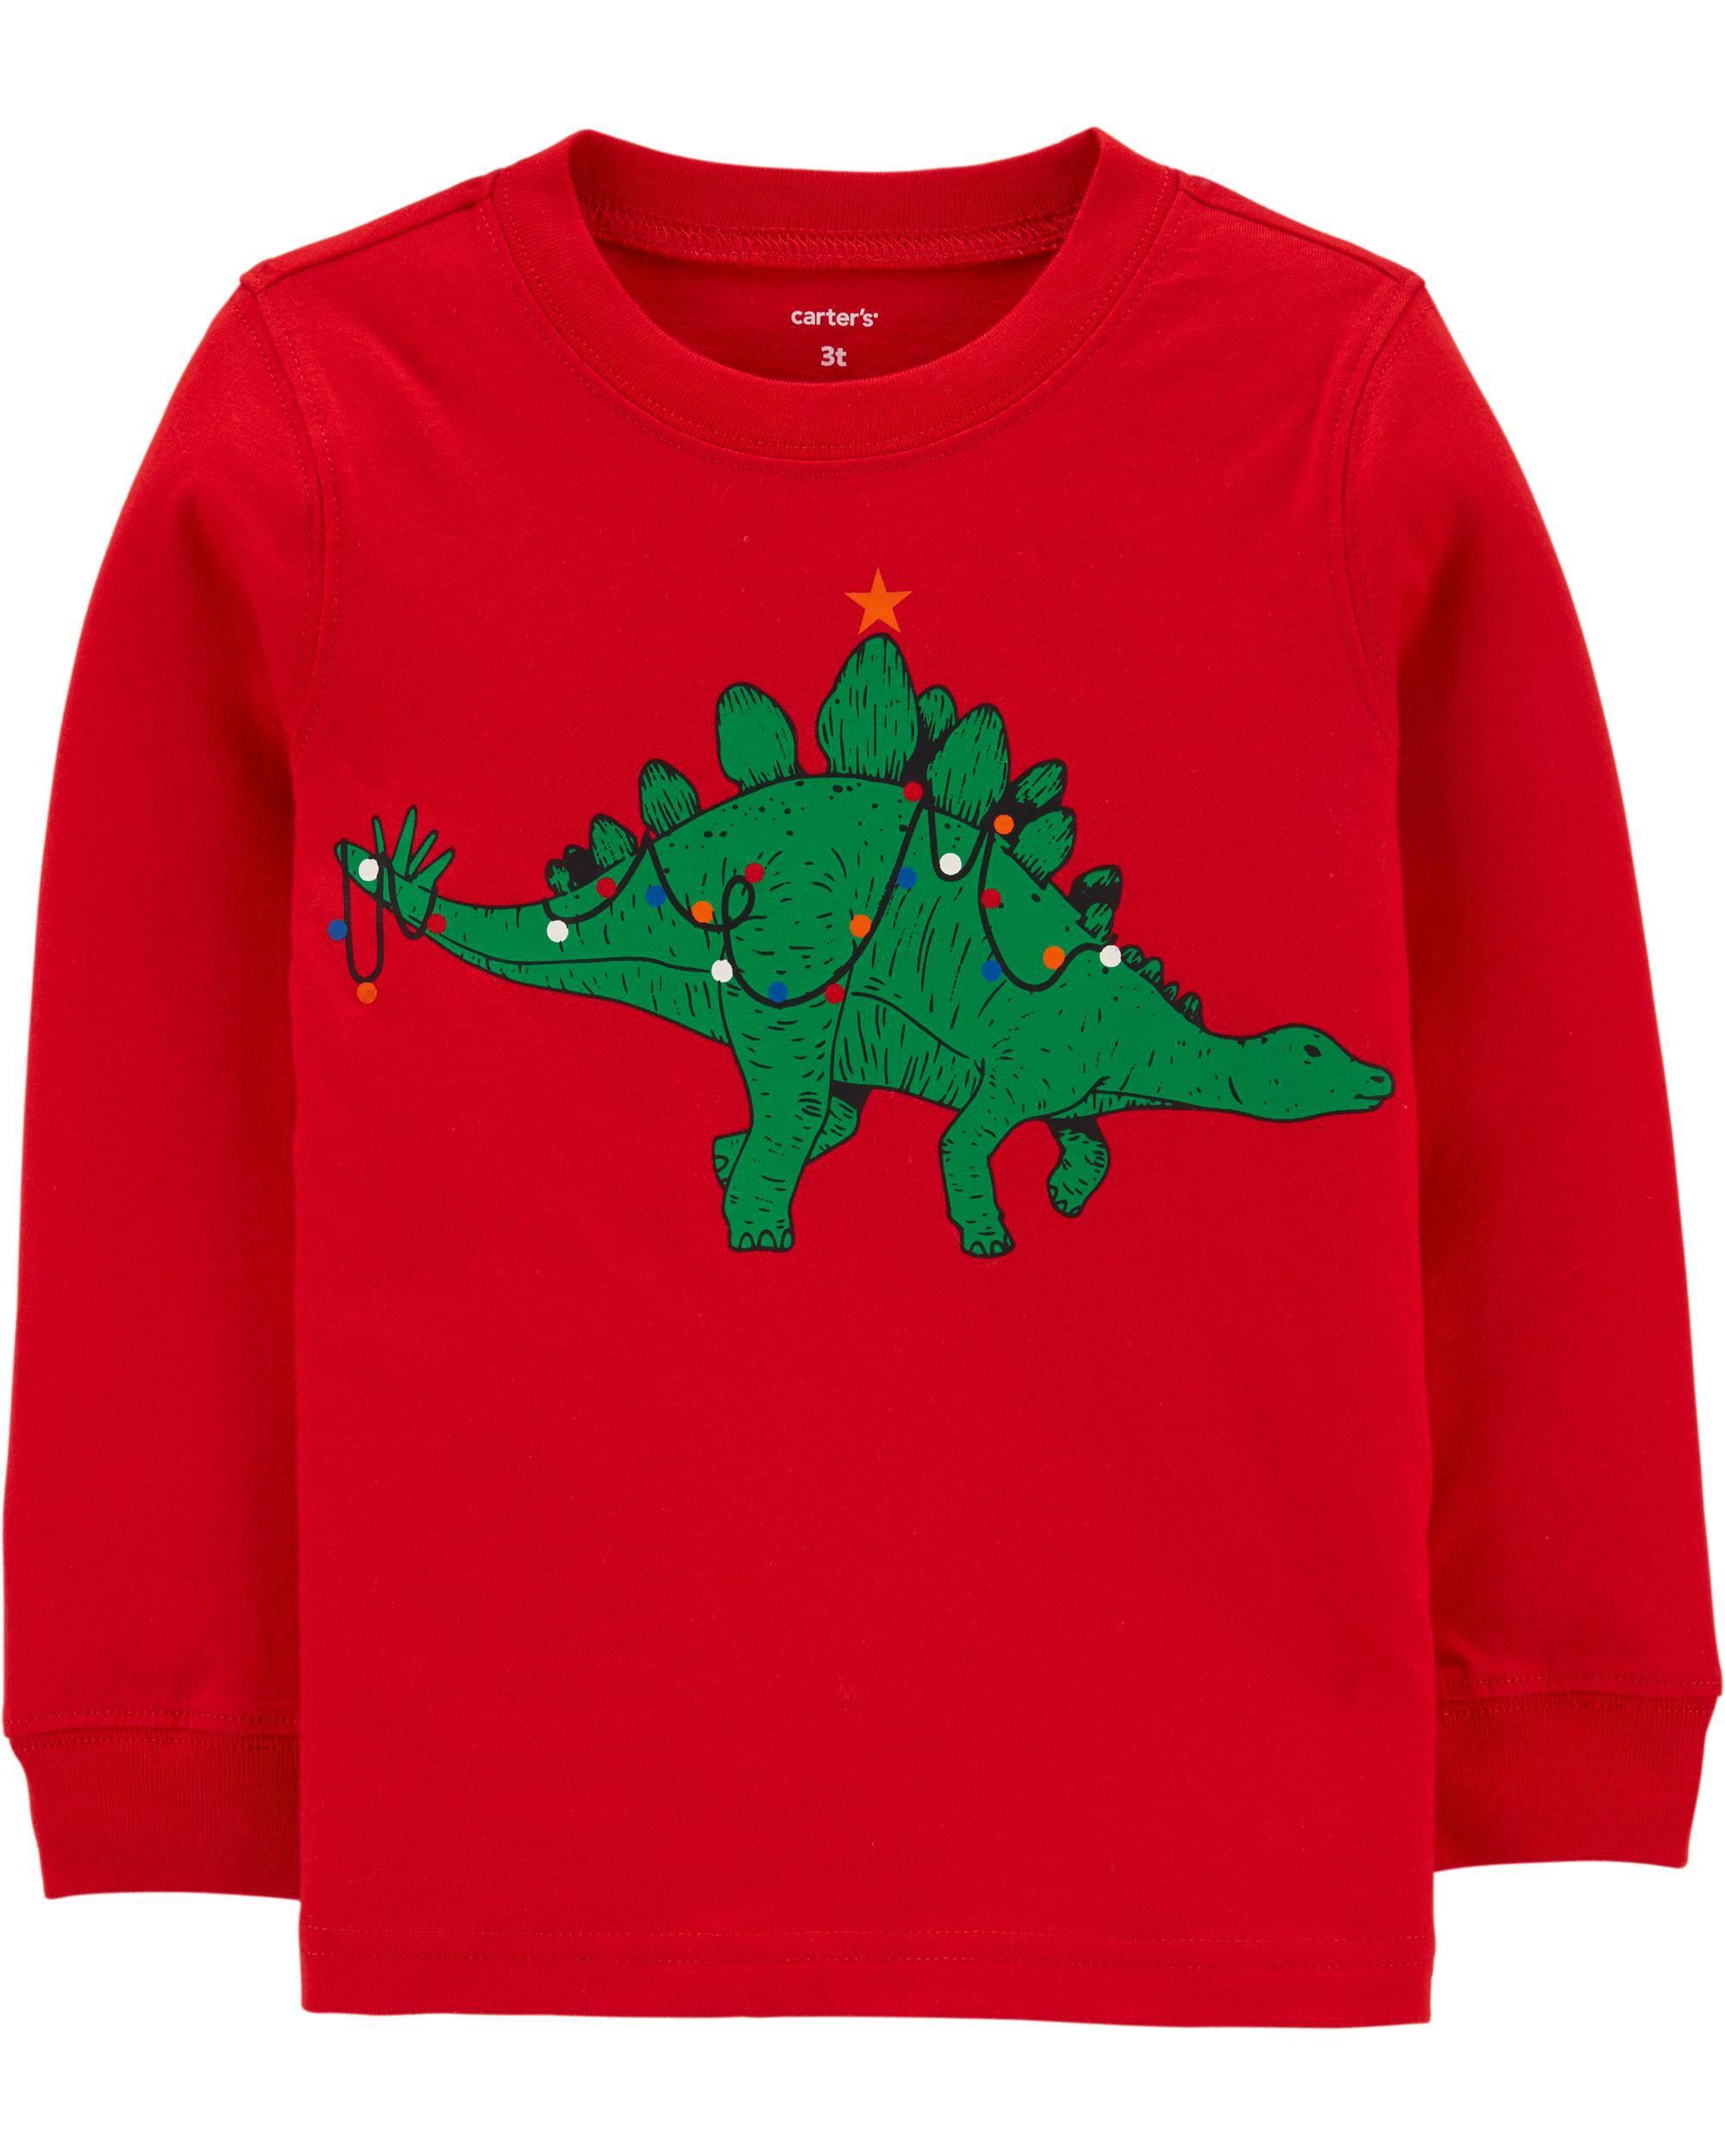 *DOORBUSTER* Christmas Dinosaur Jersey Tee